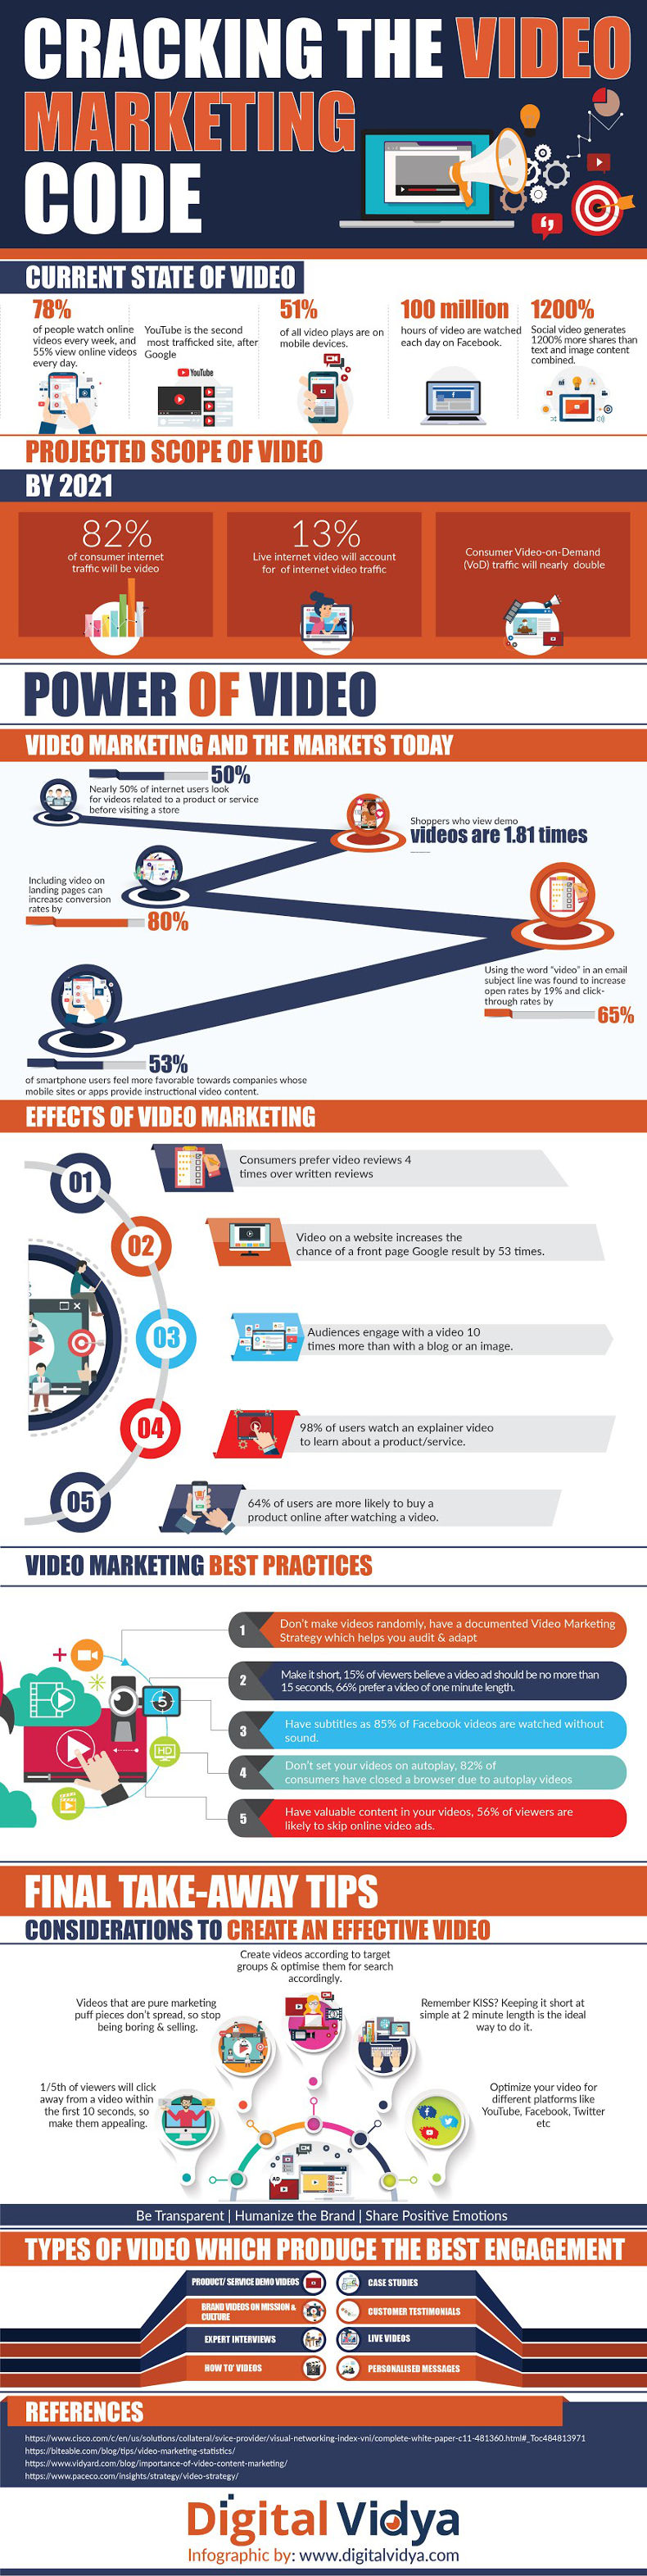 Infographic: 23 Video Marketing Statistics